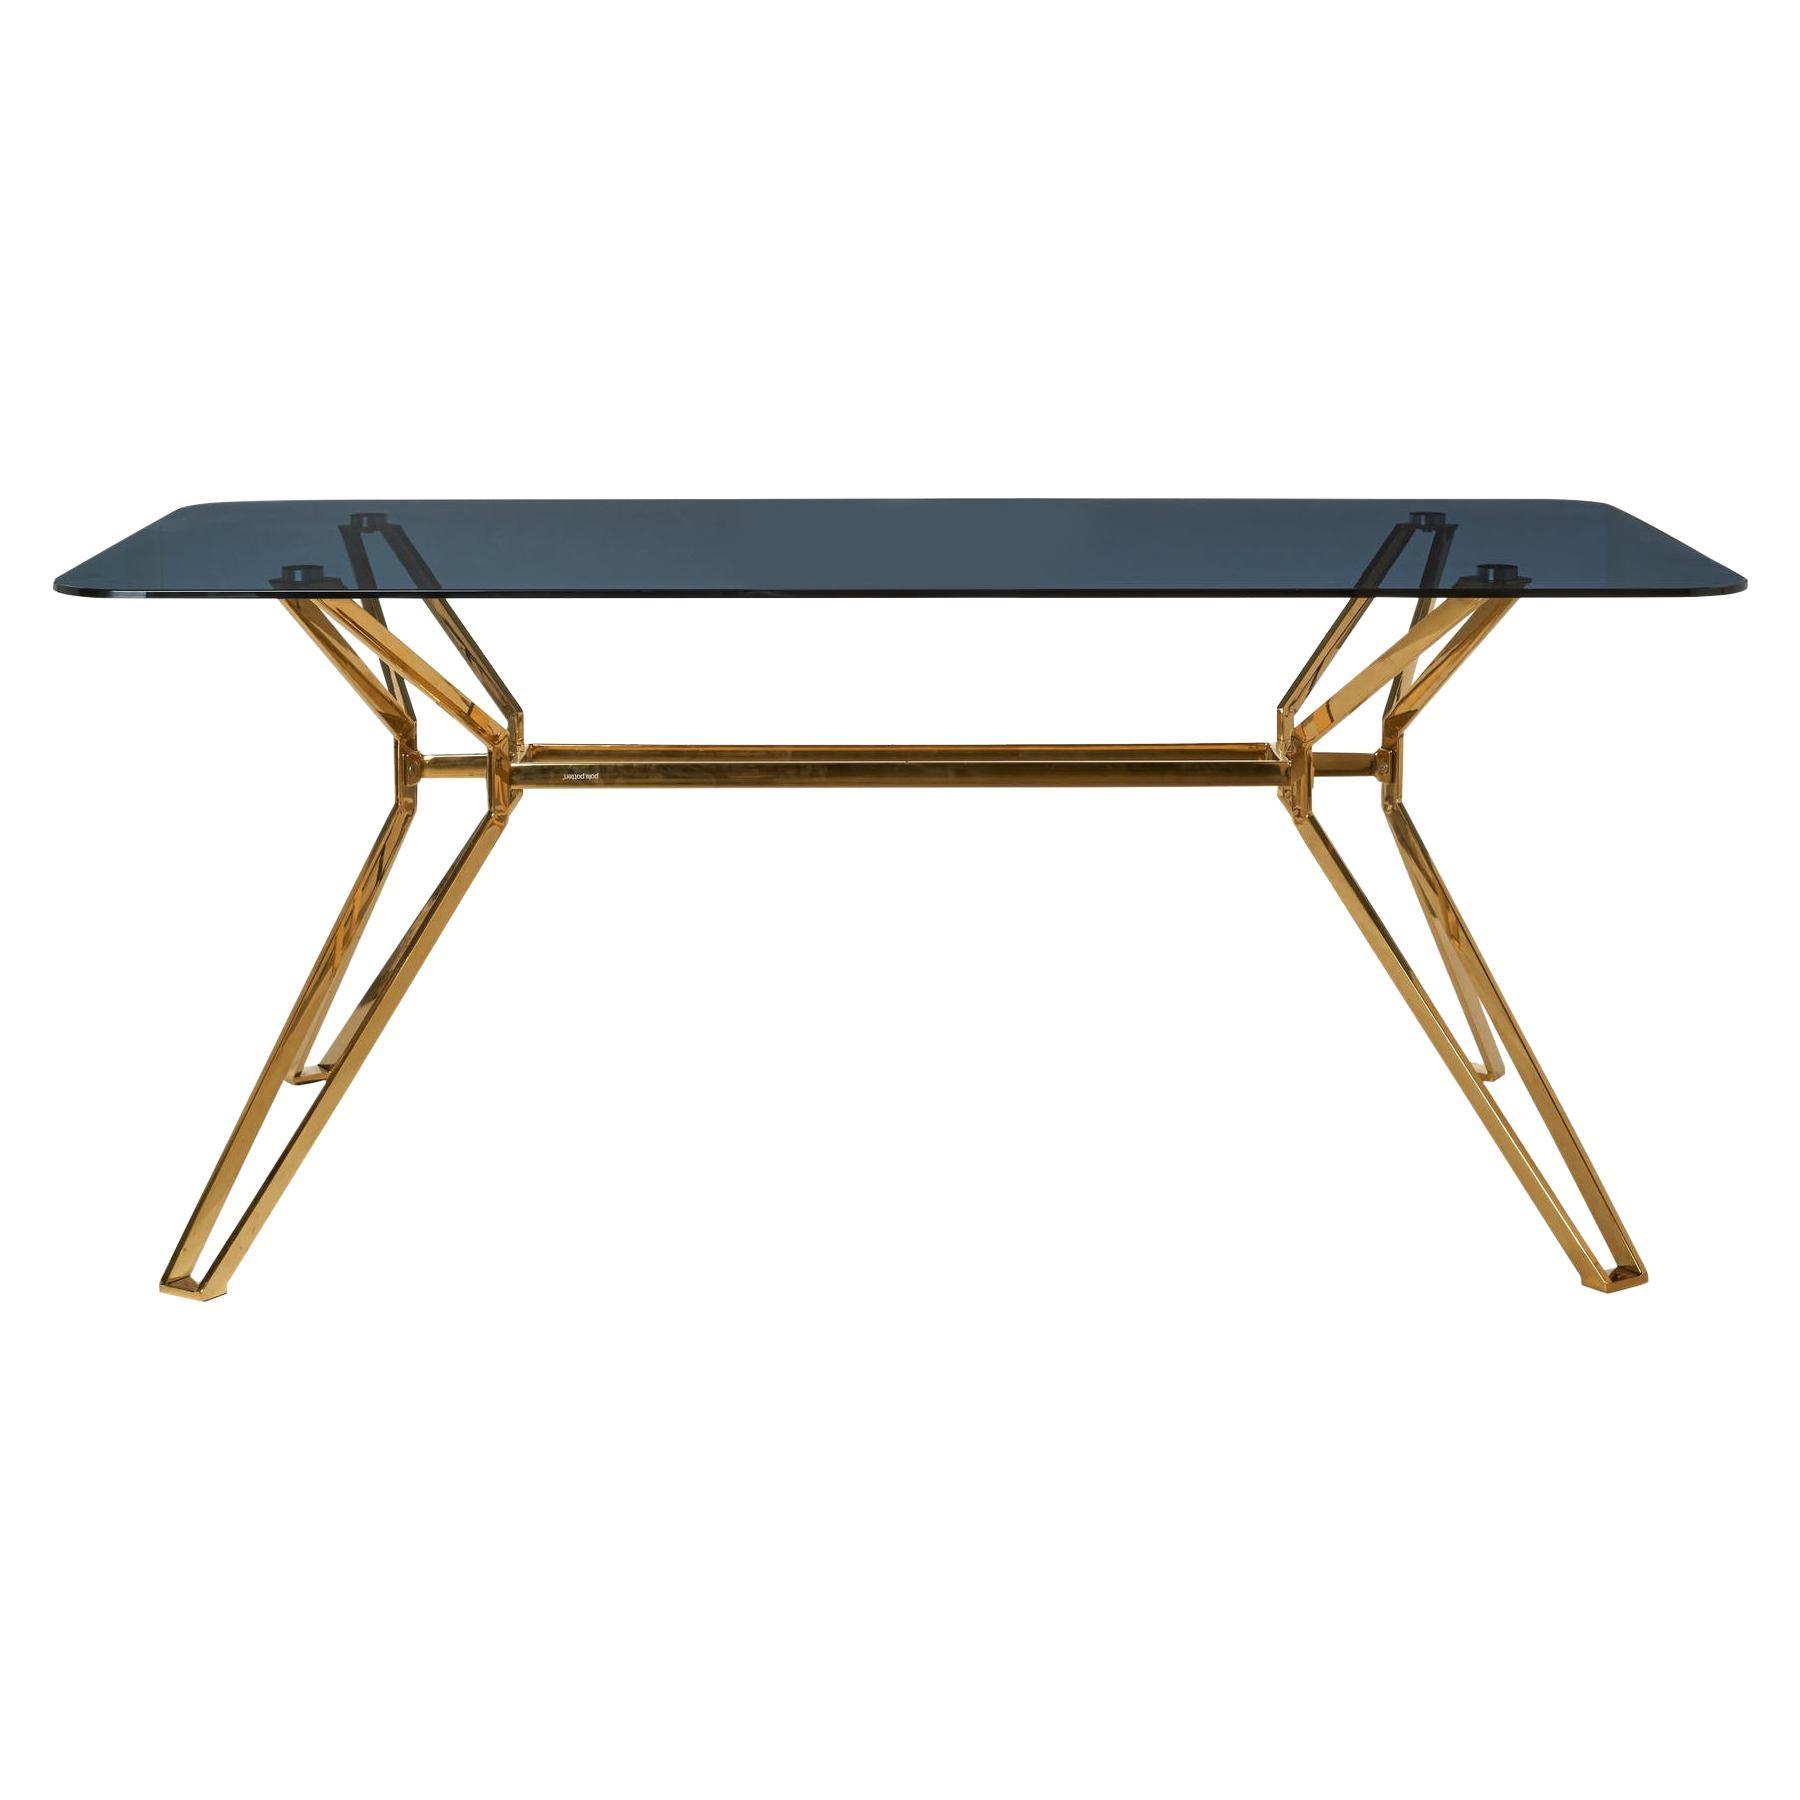 Modern Glass Dining Table, Pols Potten Studio